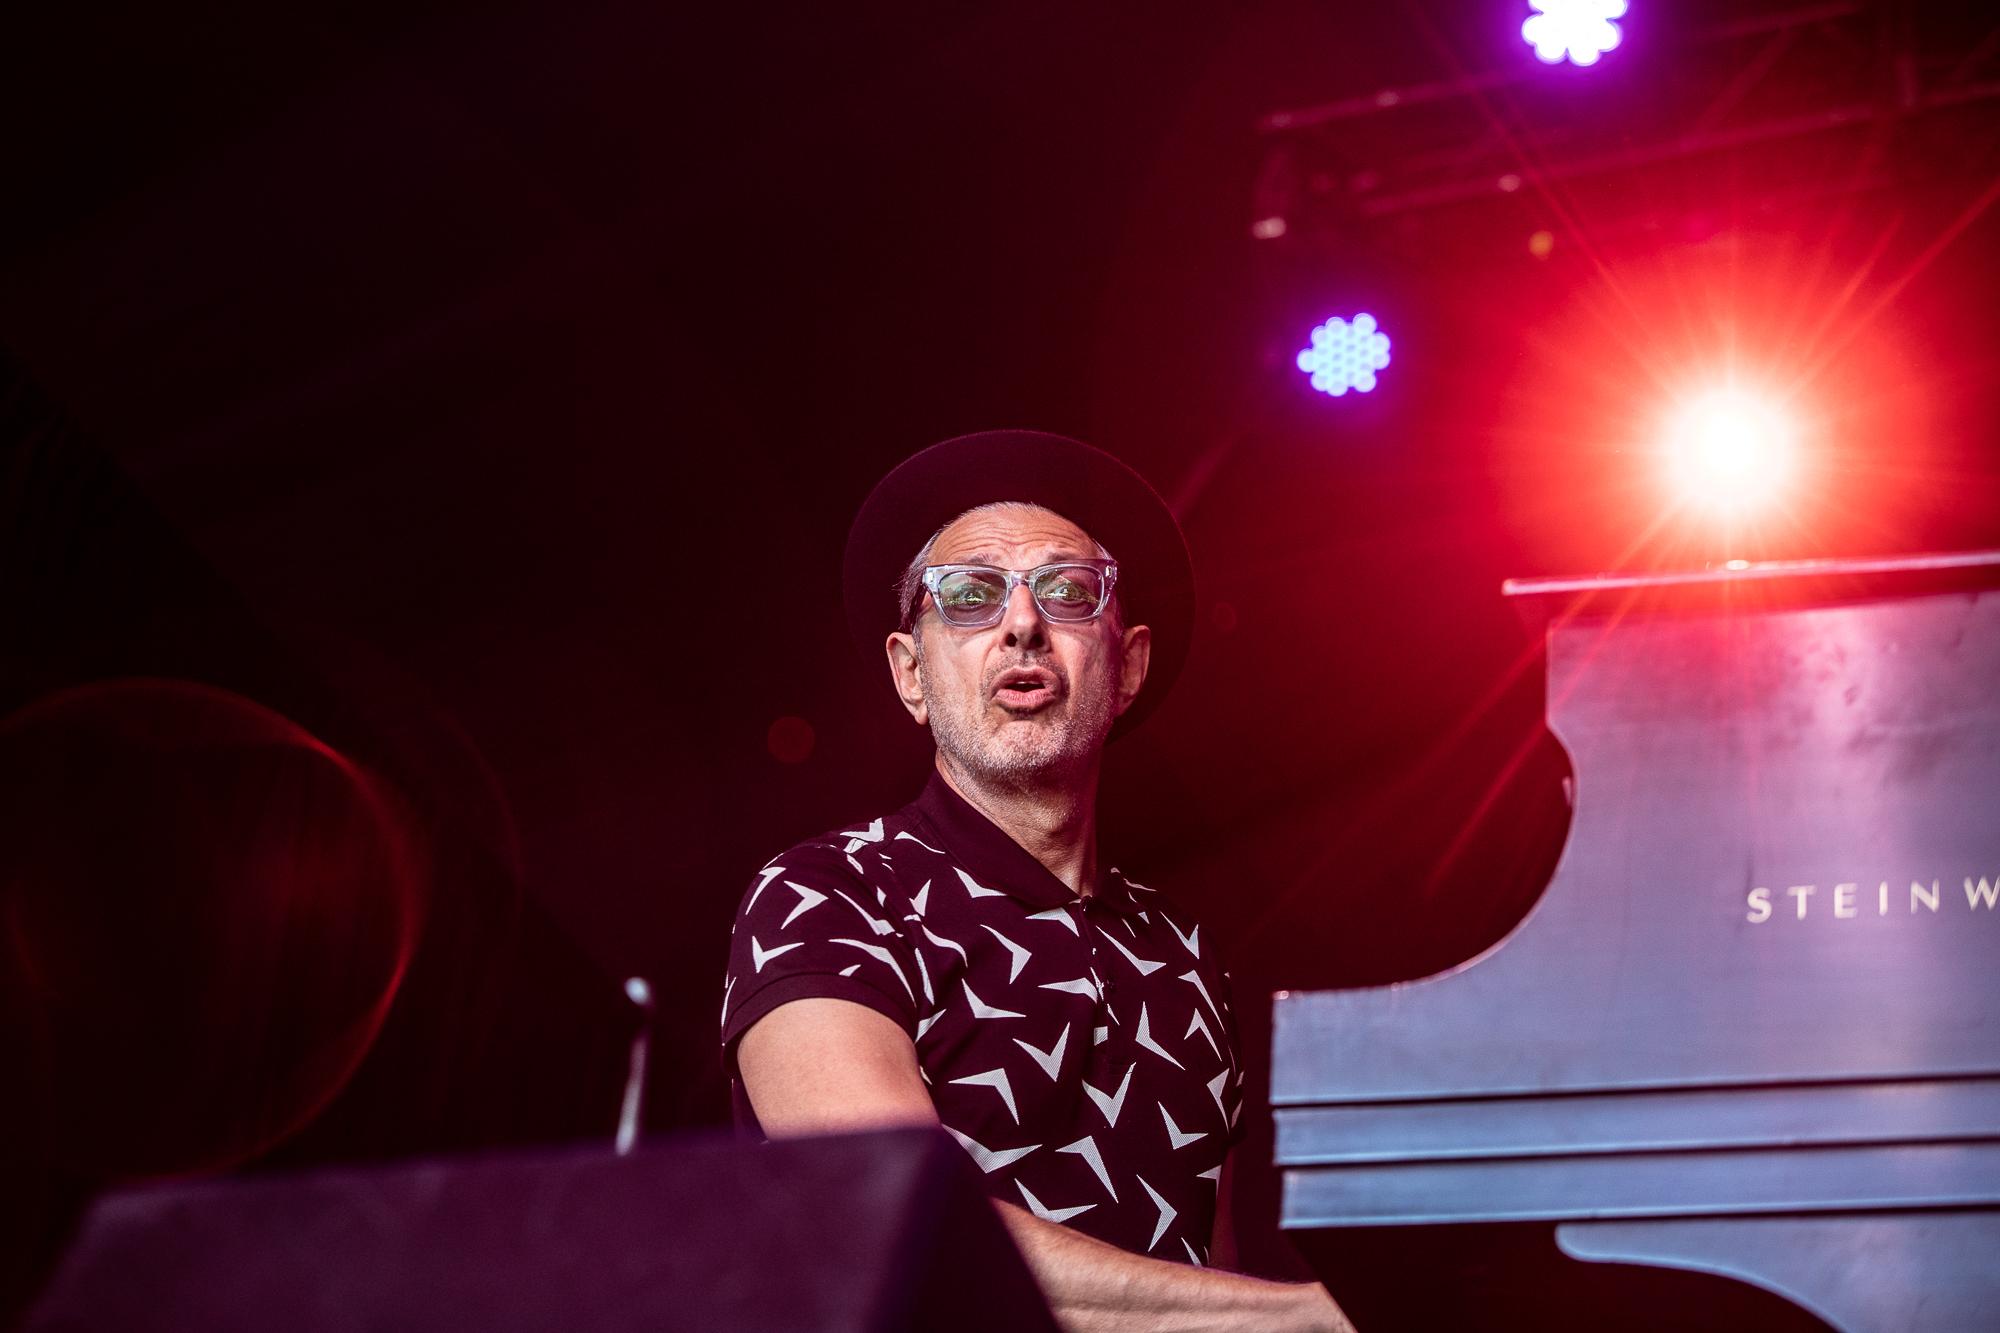 Jeff Goldblum, photo by Debi Del Grande